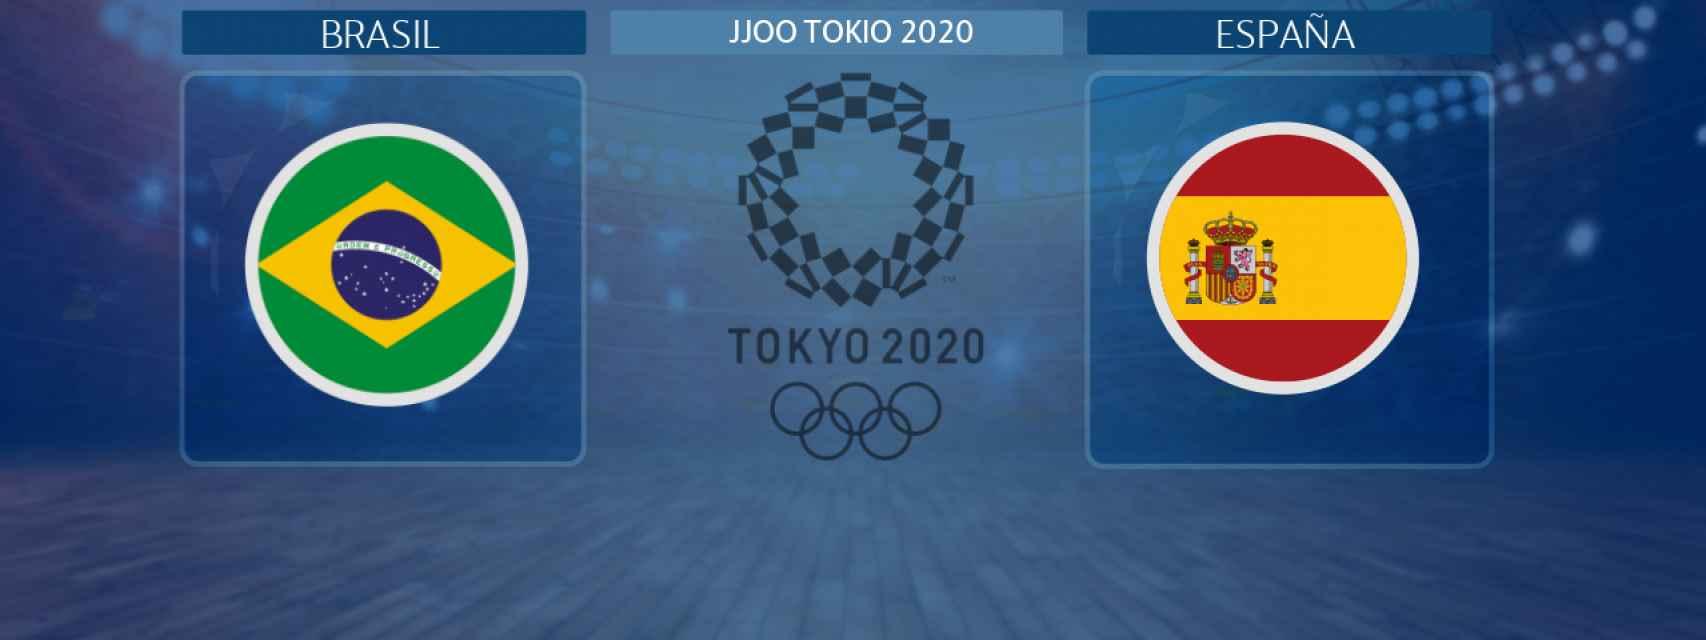 Brasil - España,  partido de balonmano masculino de los JJOO Tokio 2020